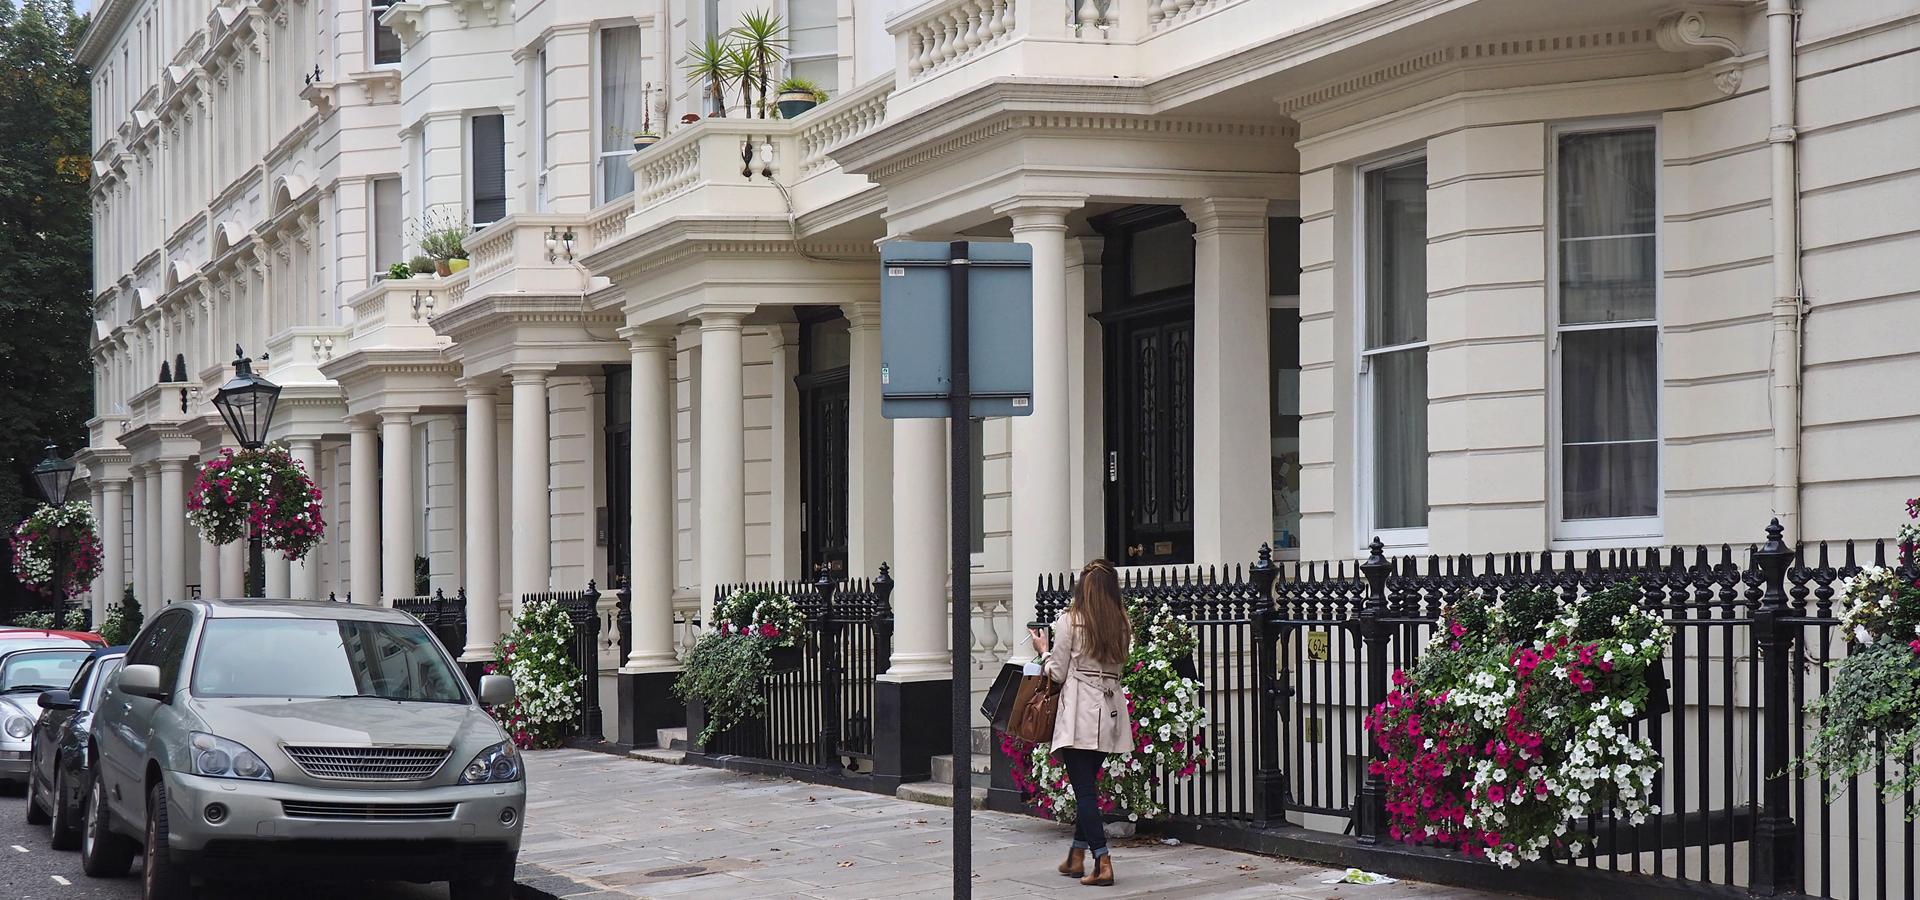 Kensington, Greater London, England, Great Britain